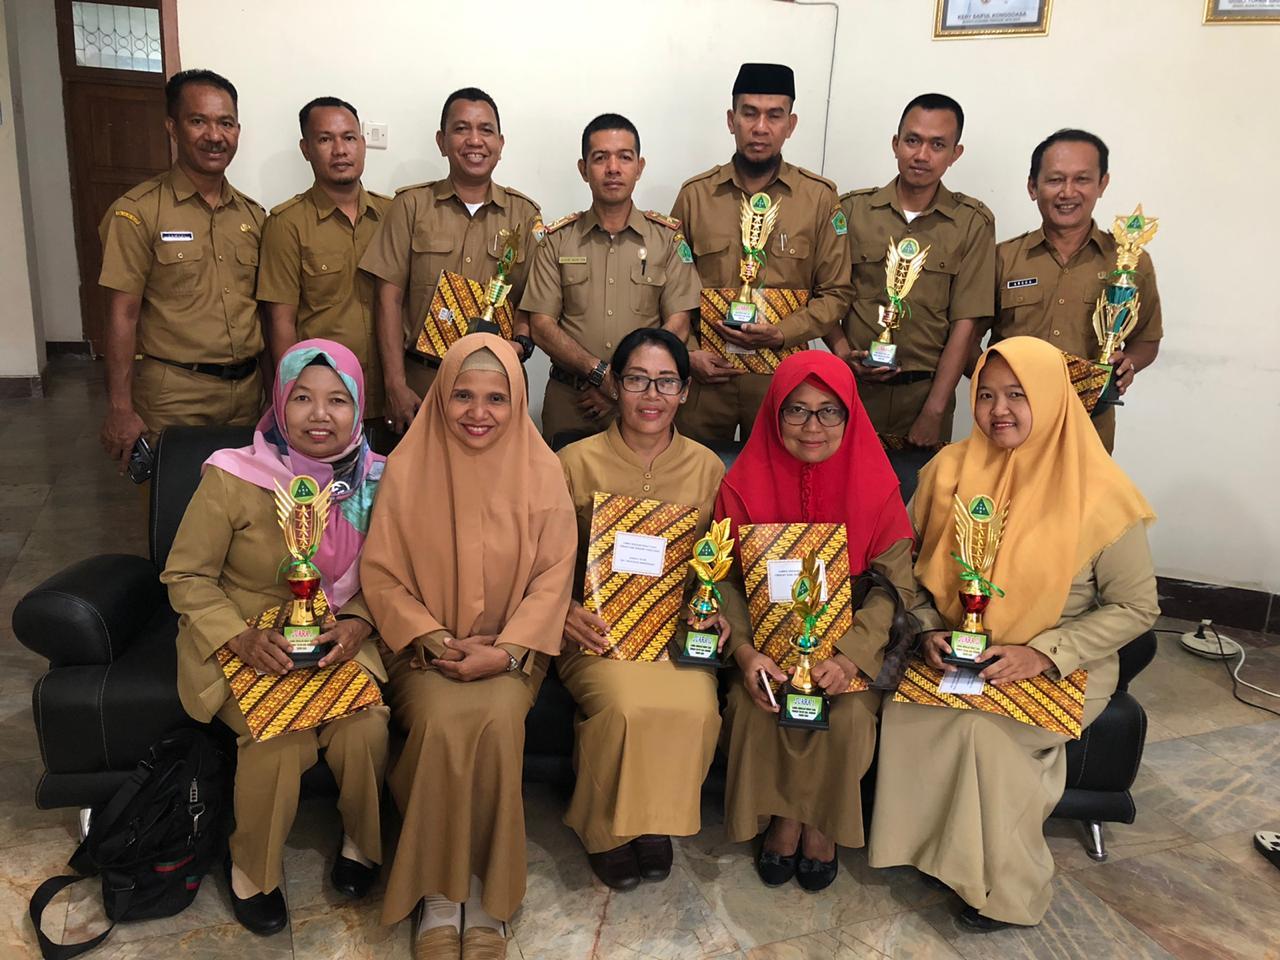 Ketgam : foto bersama Kabag kesra dan para kepala sekolah penerima penghargaan